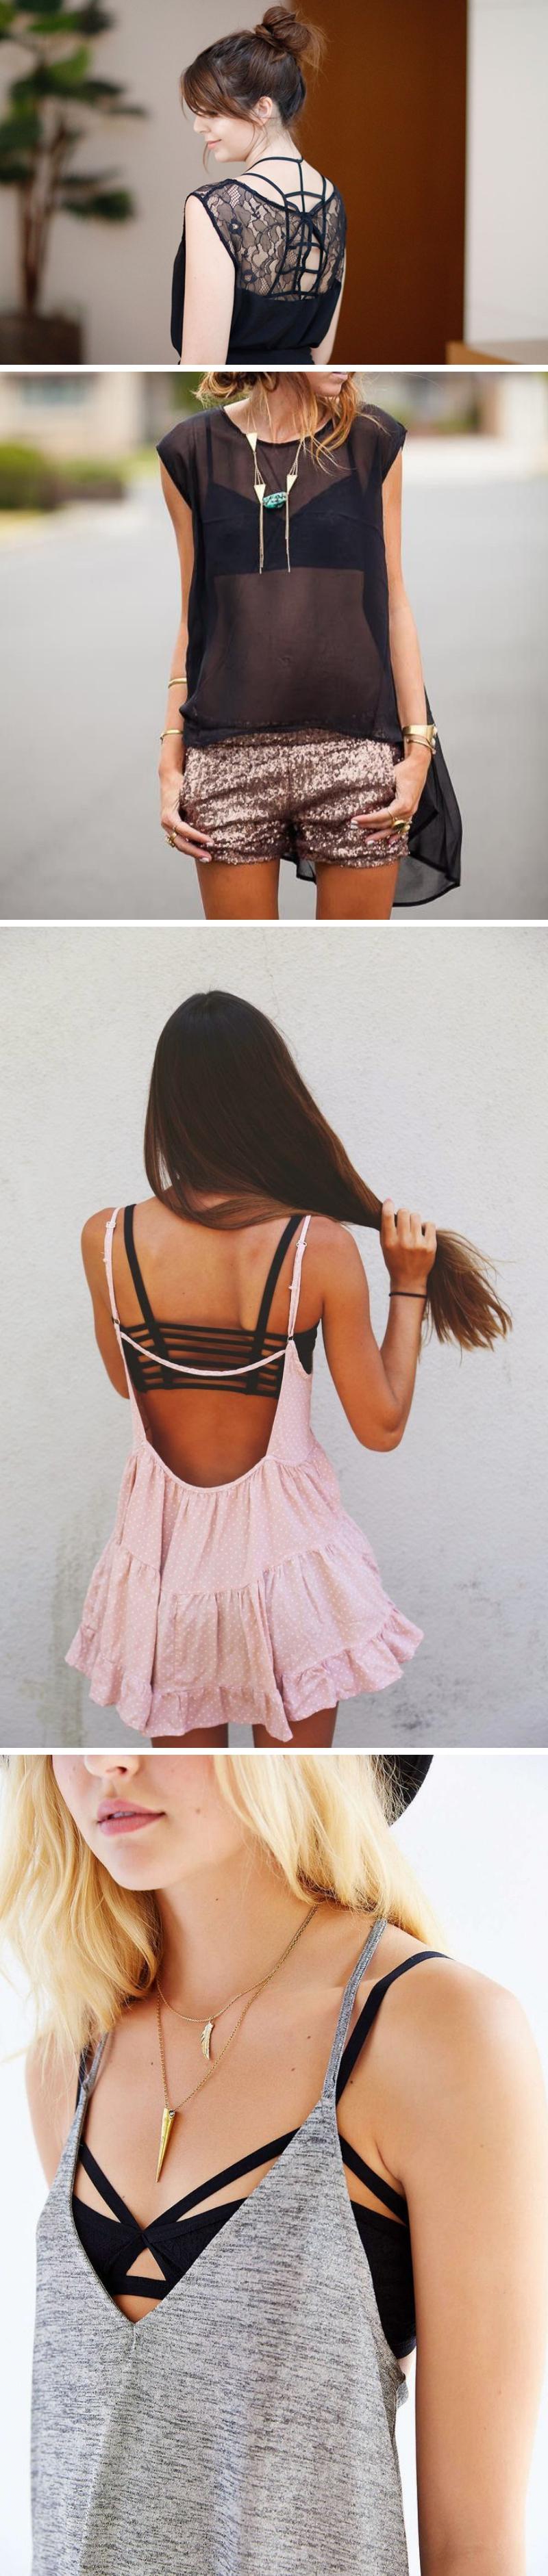 strappy bra 2